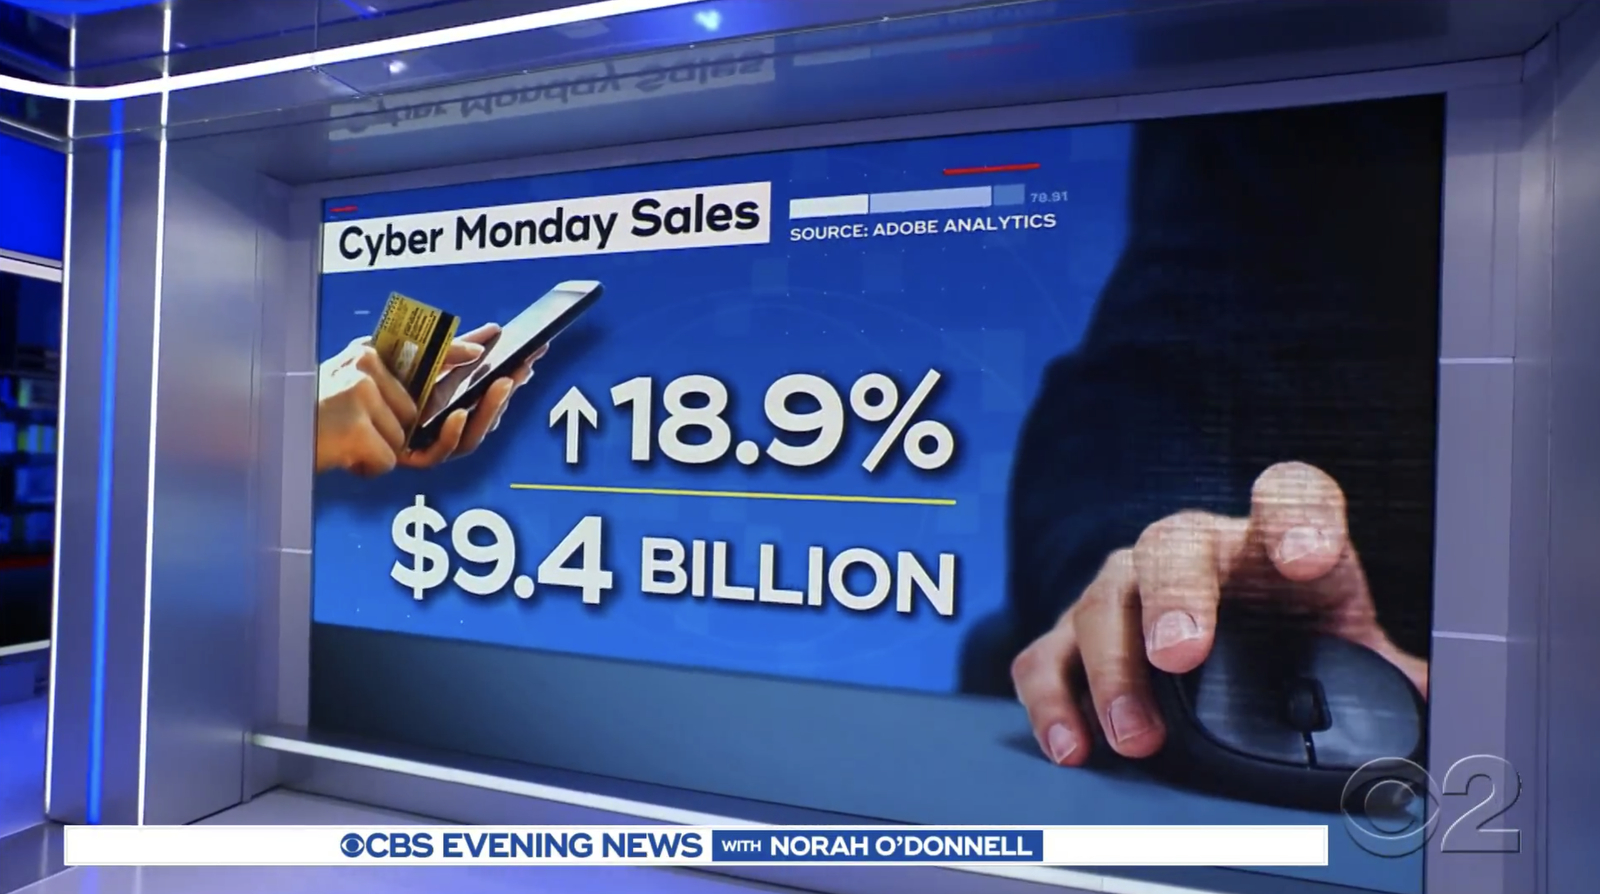 NCS_CBS-Evening-News_Motion-Design_Washington_019